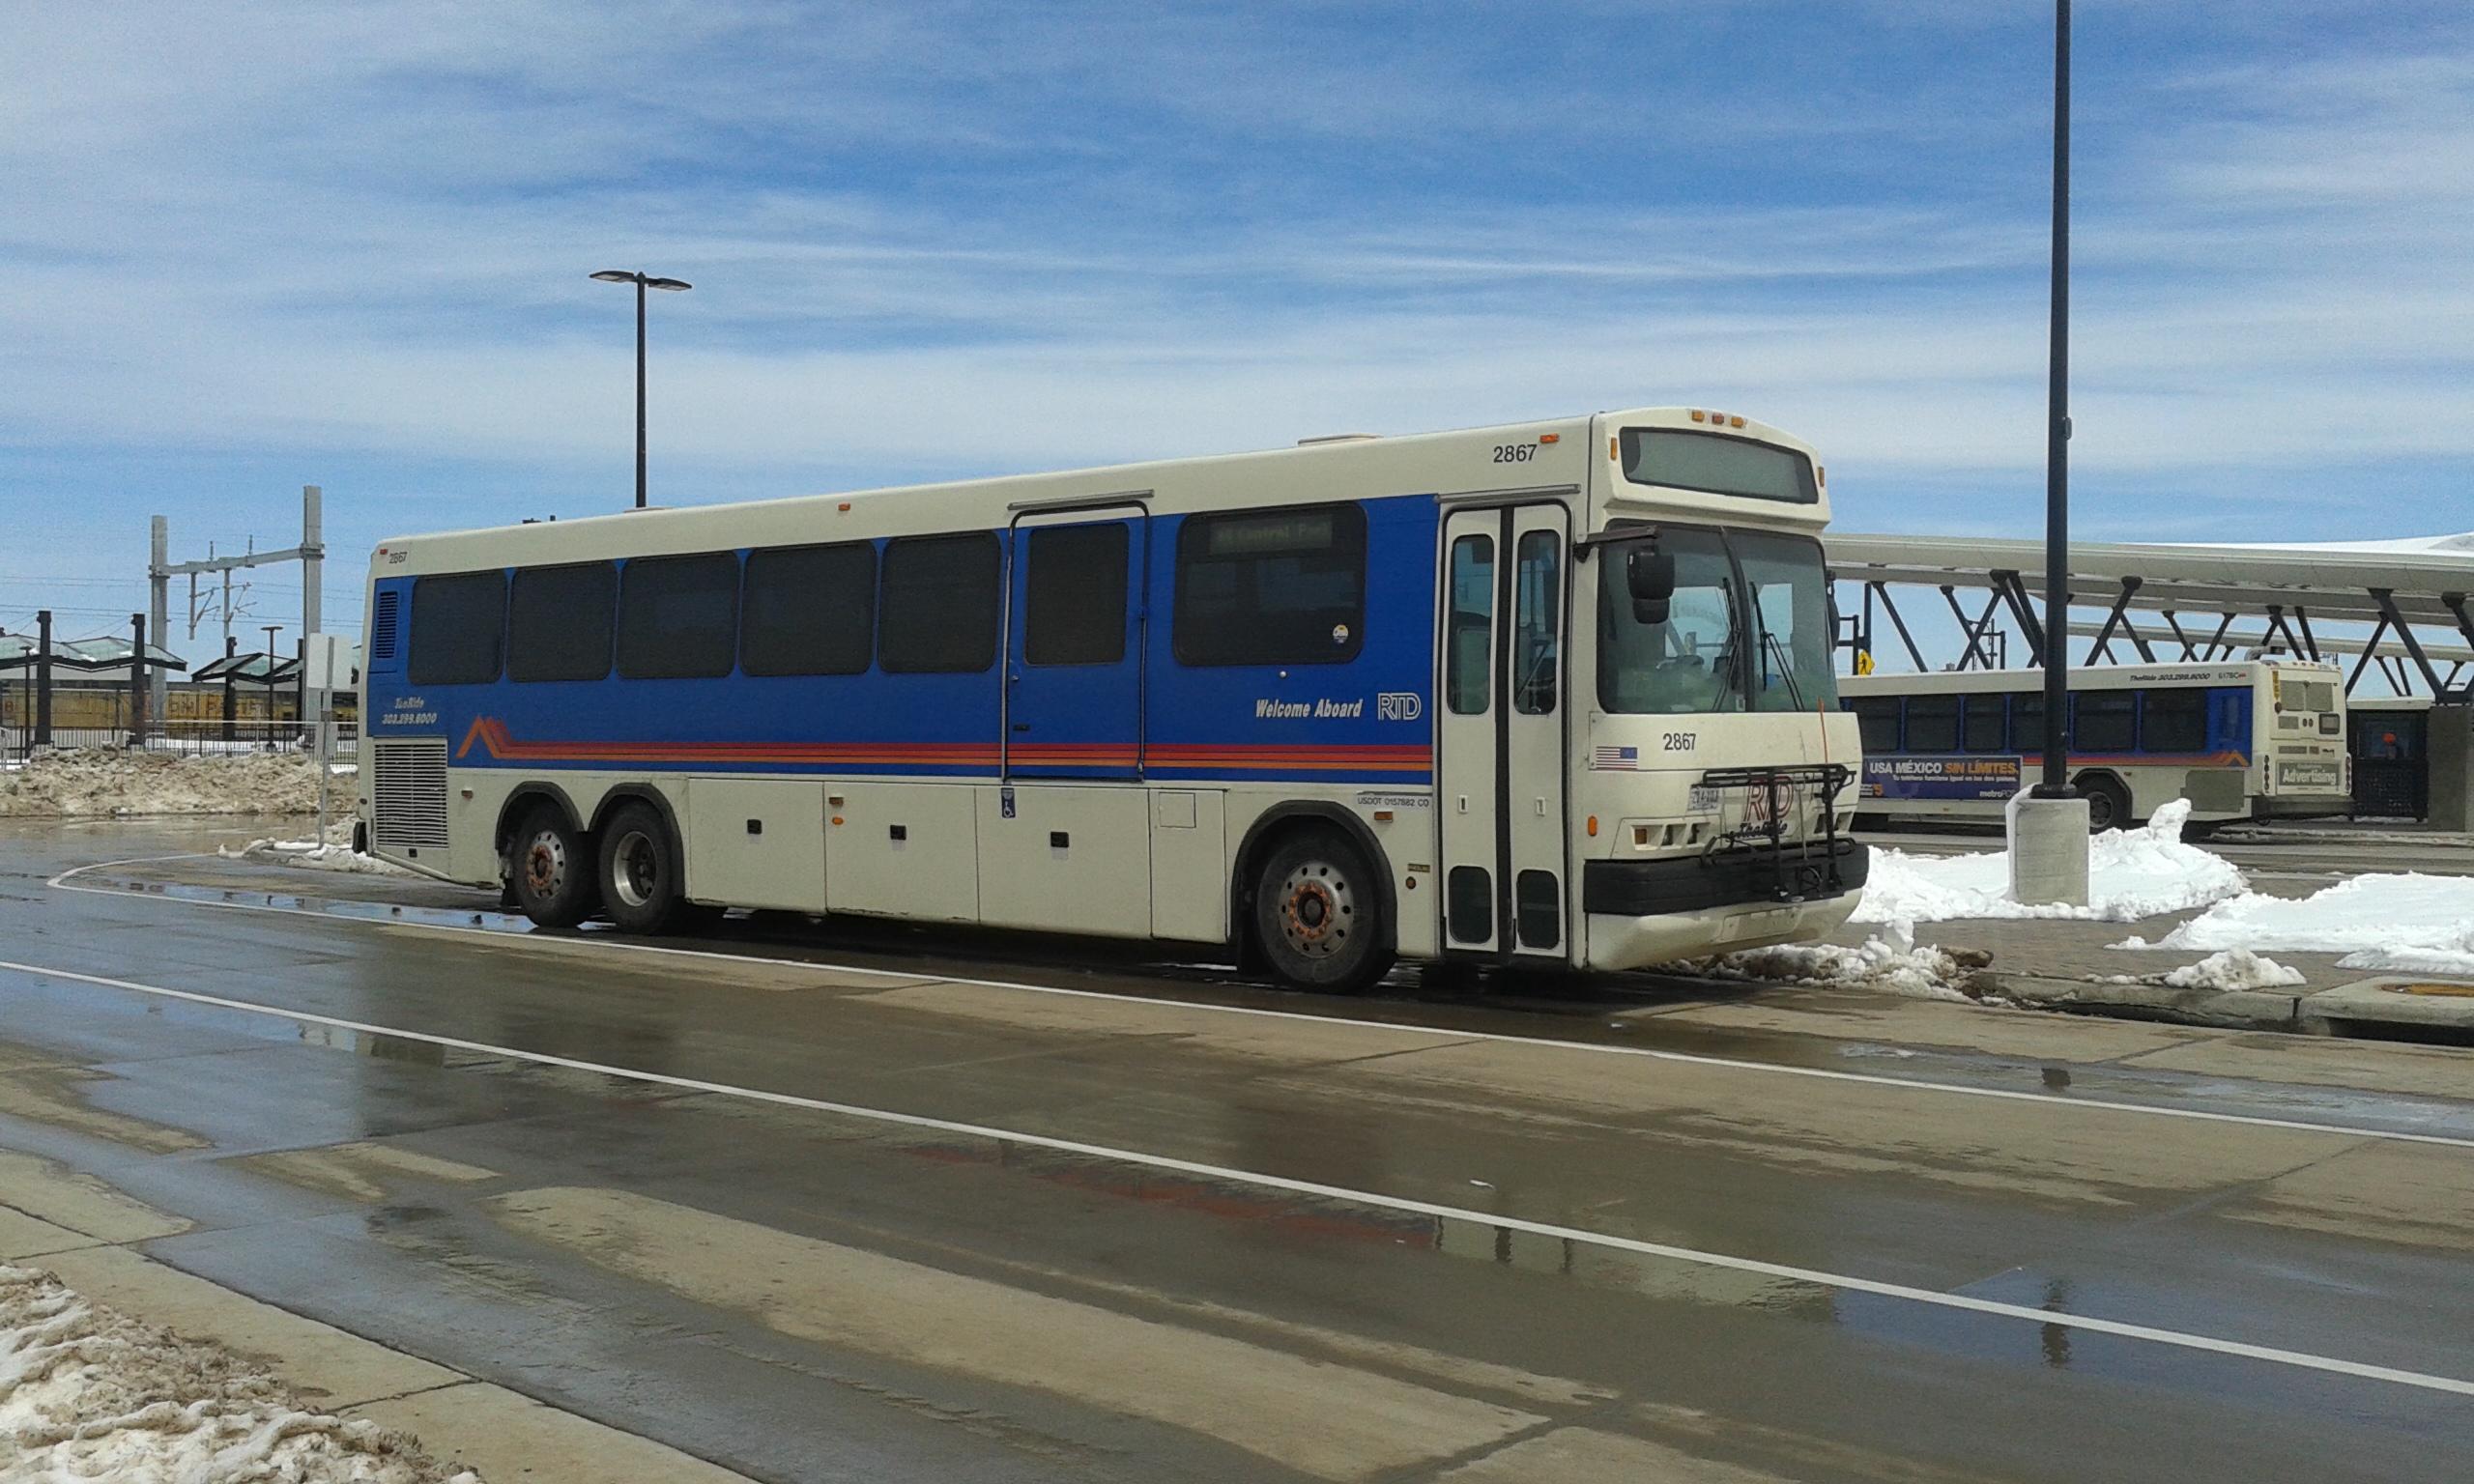 File:RTD bus 2867 Central Park Station.jpg